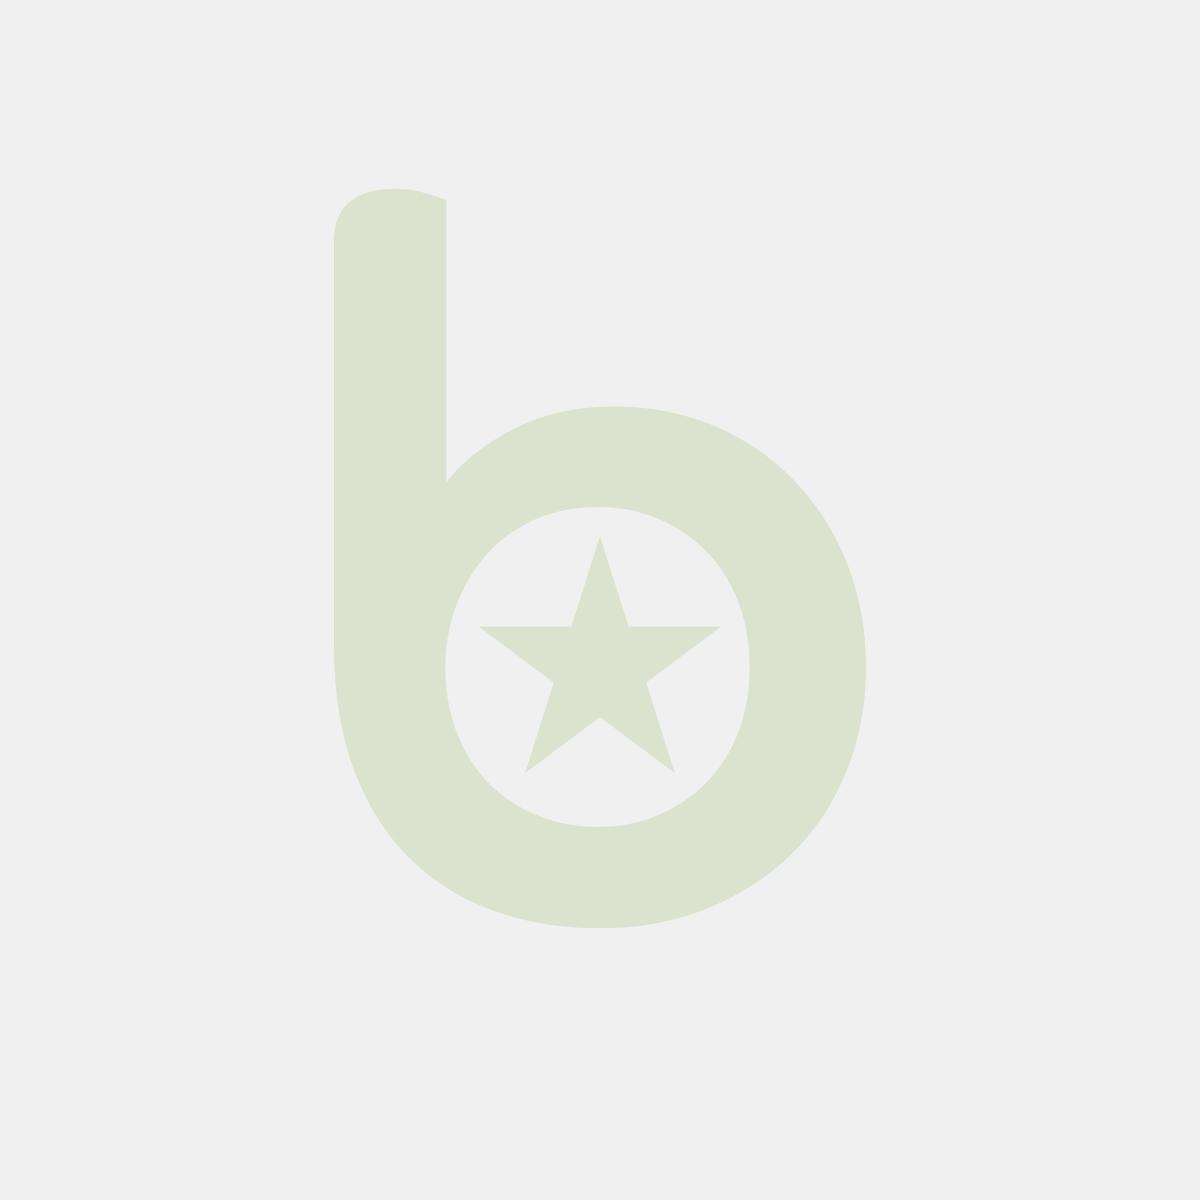 Pojemnik Gn 1/4 - 265X162 Mm 65